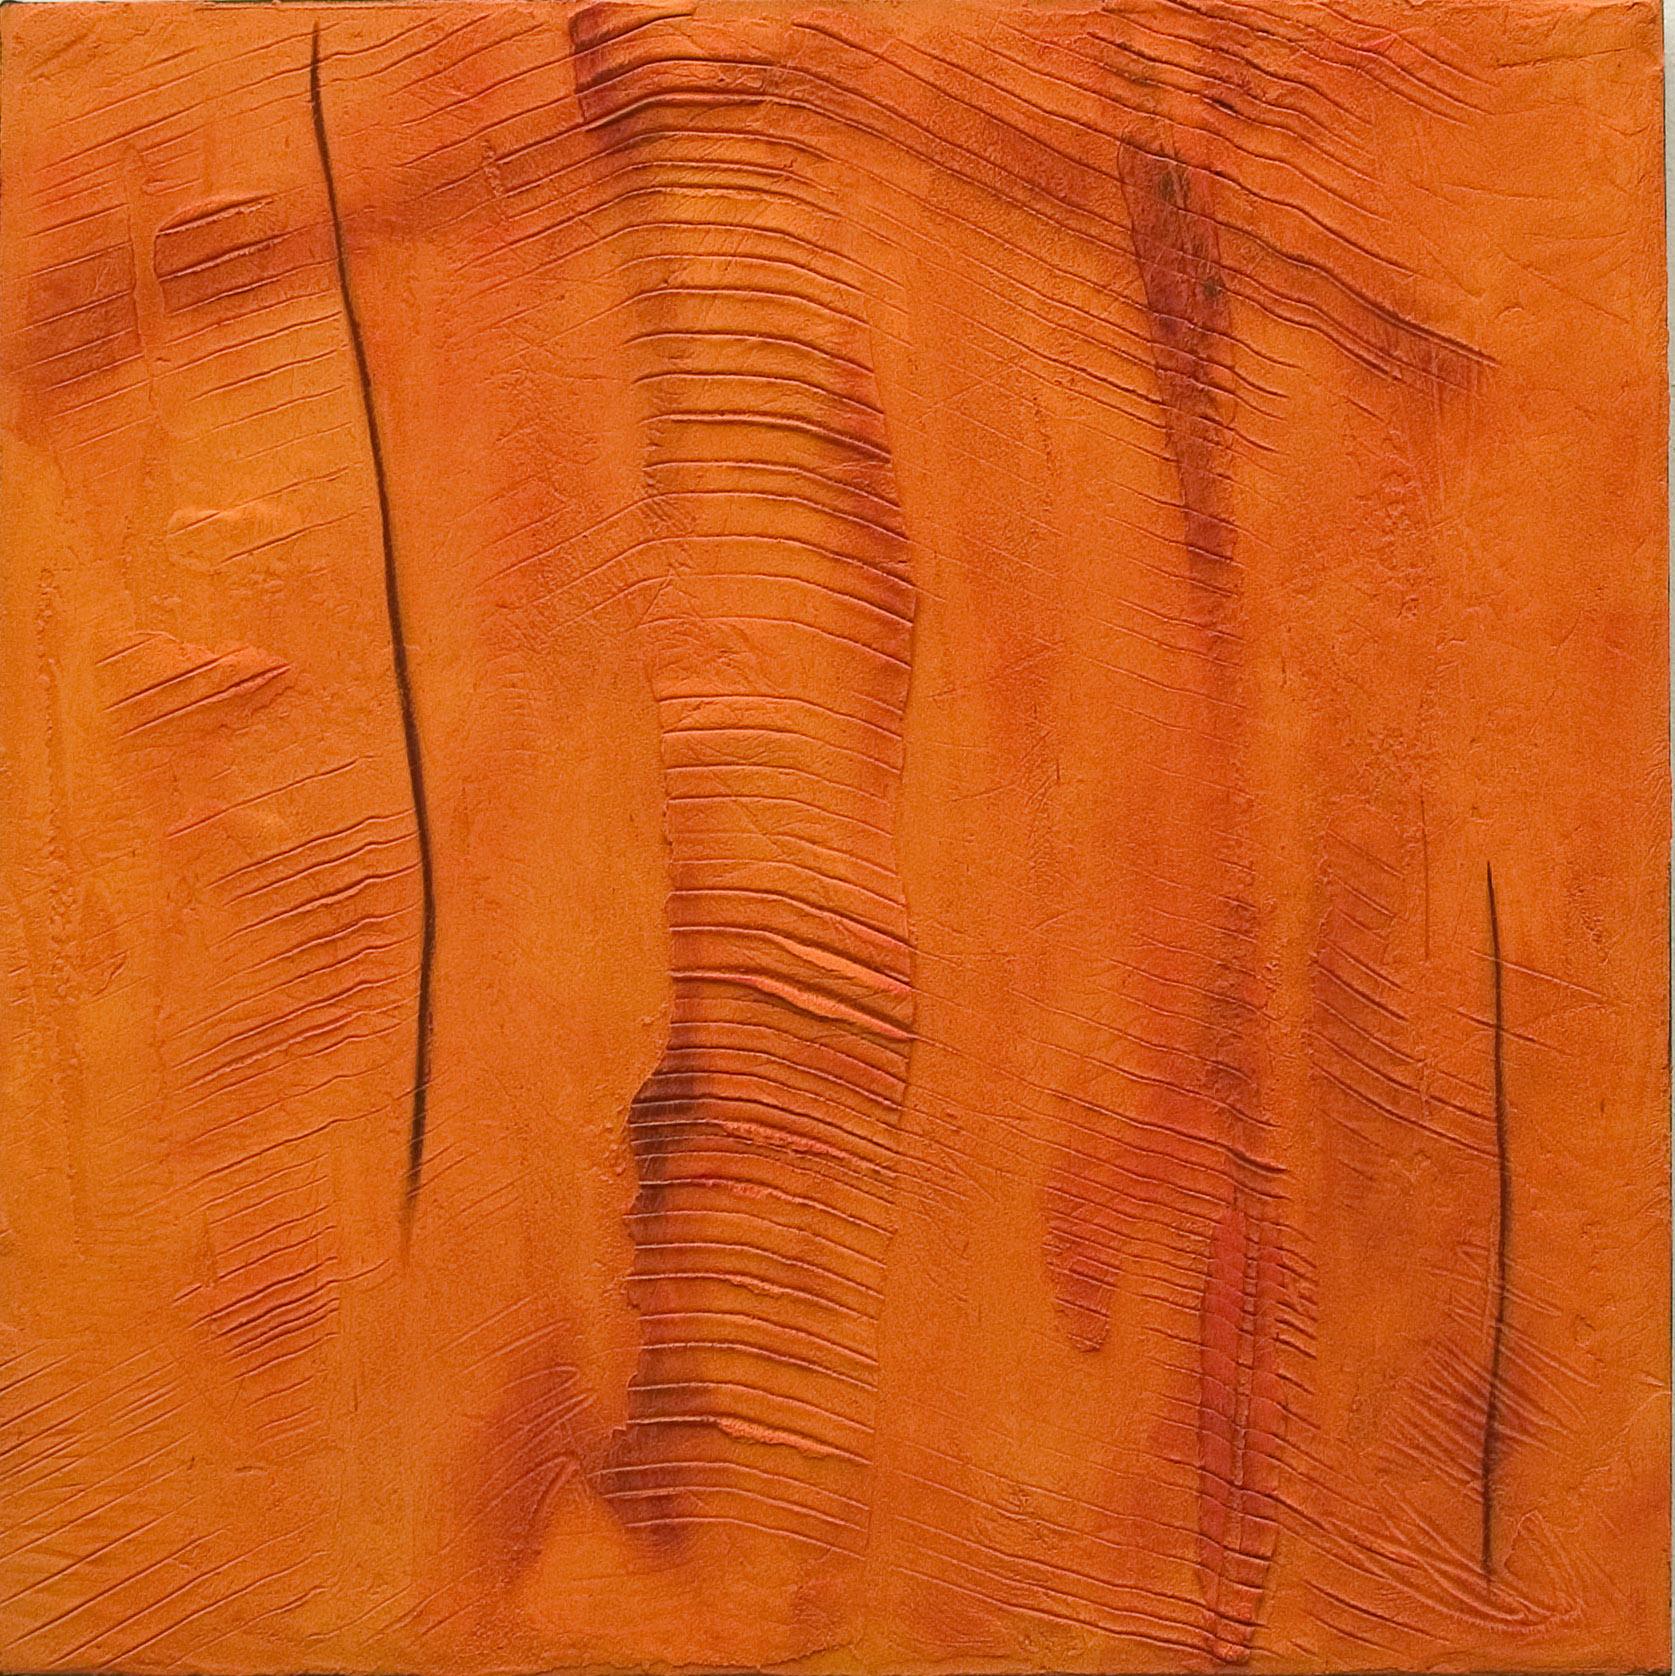 Art Atrium Kate Briscoe Earth Lines Rockface Katherine Gorge #12 76X76cm